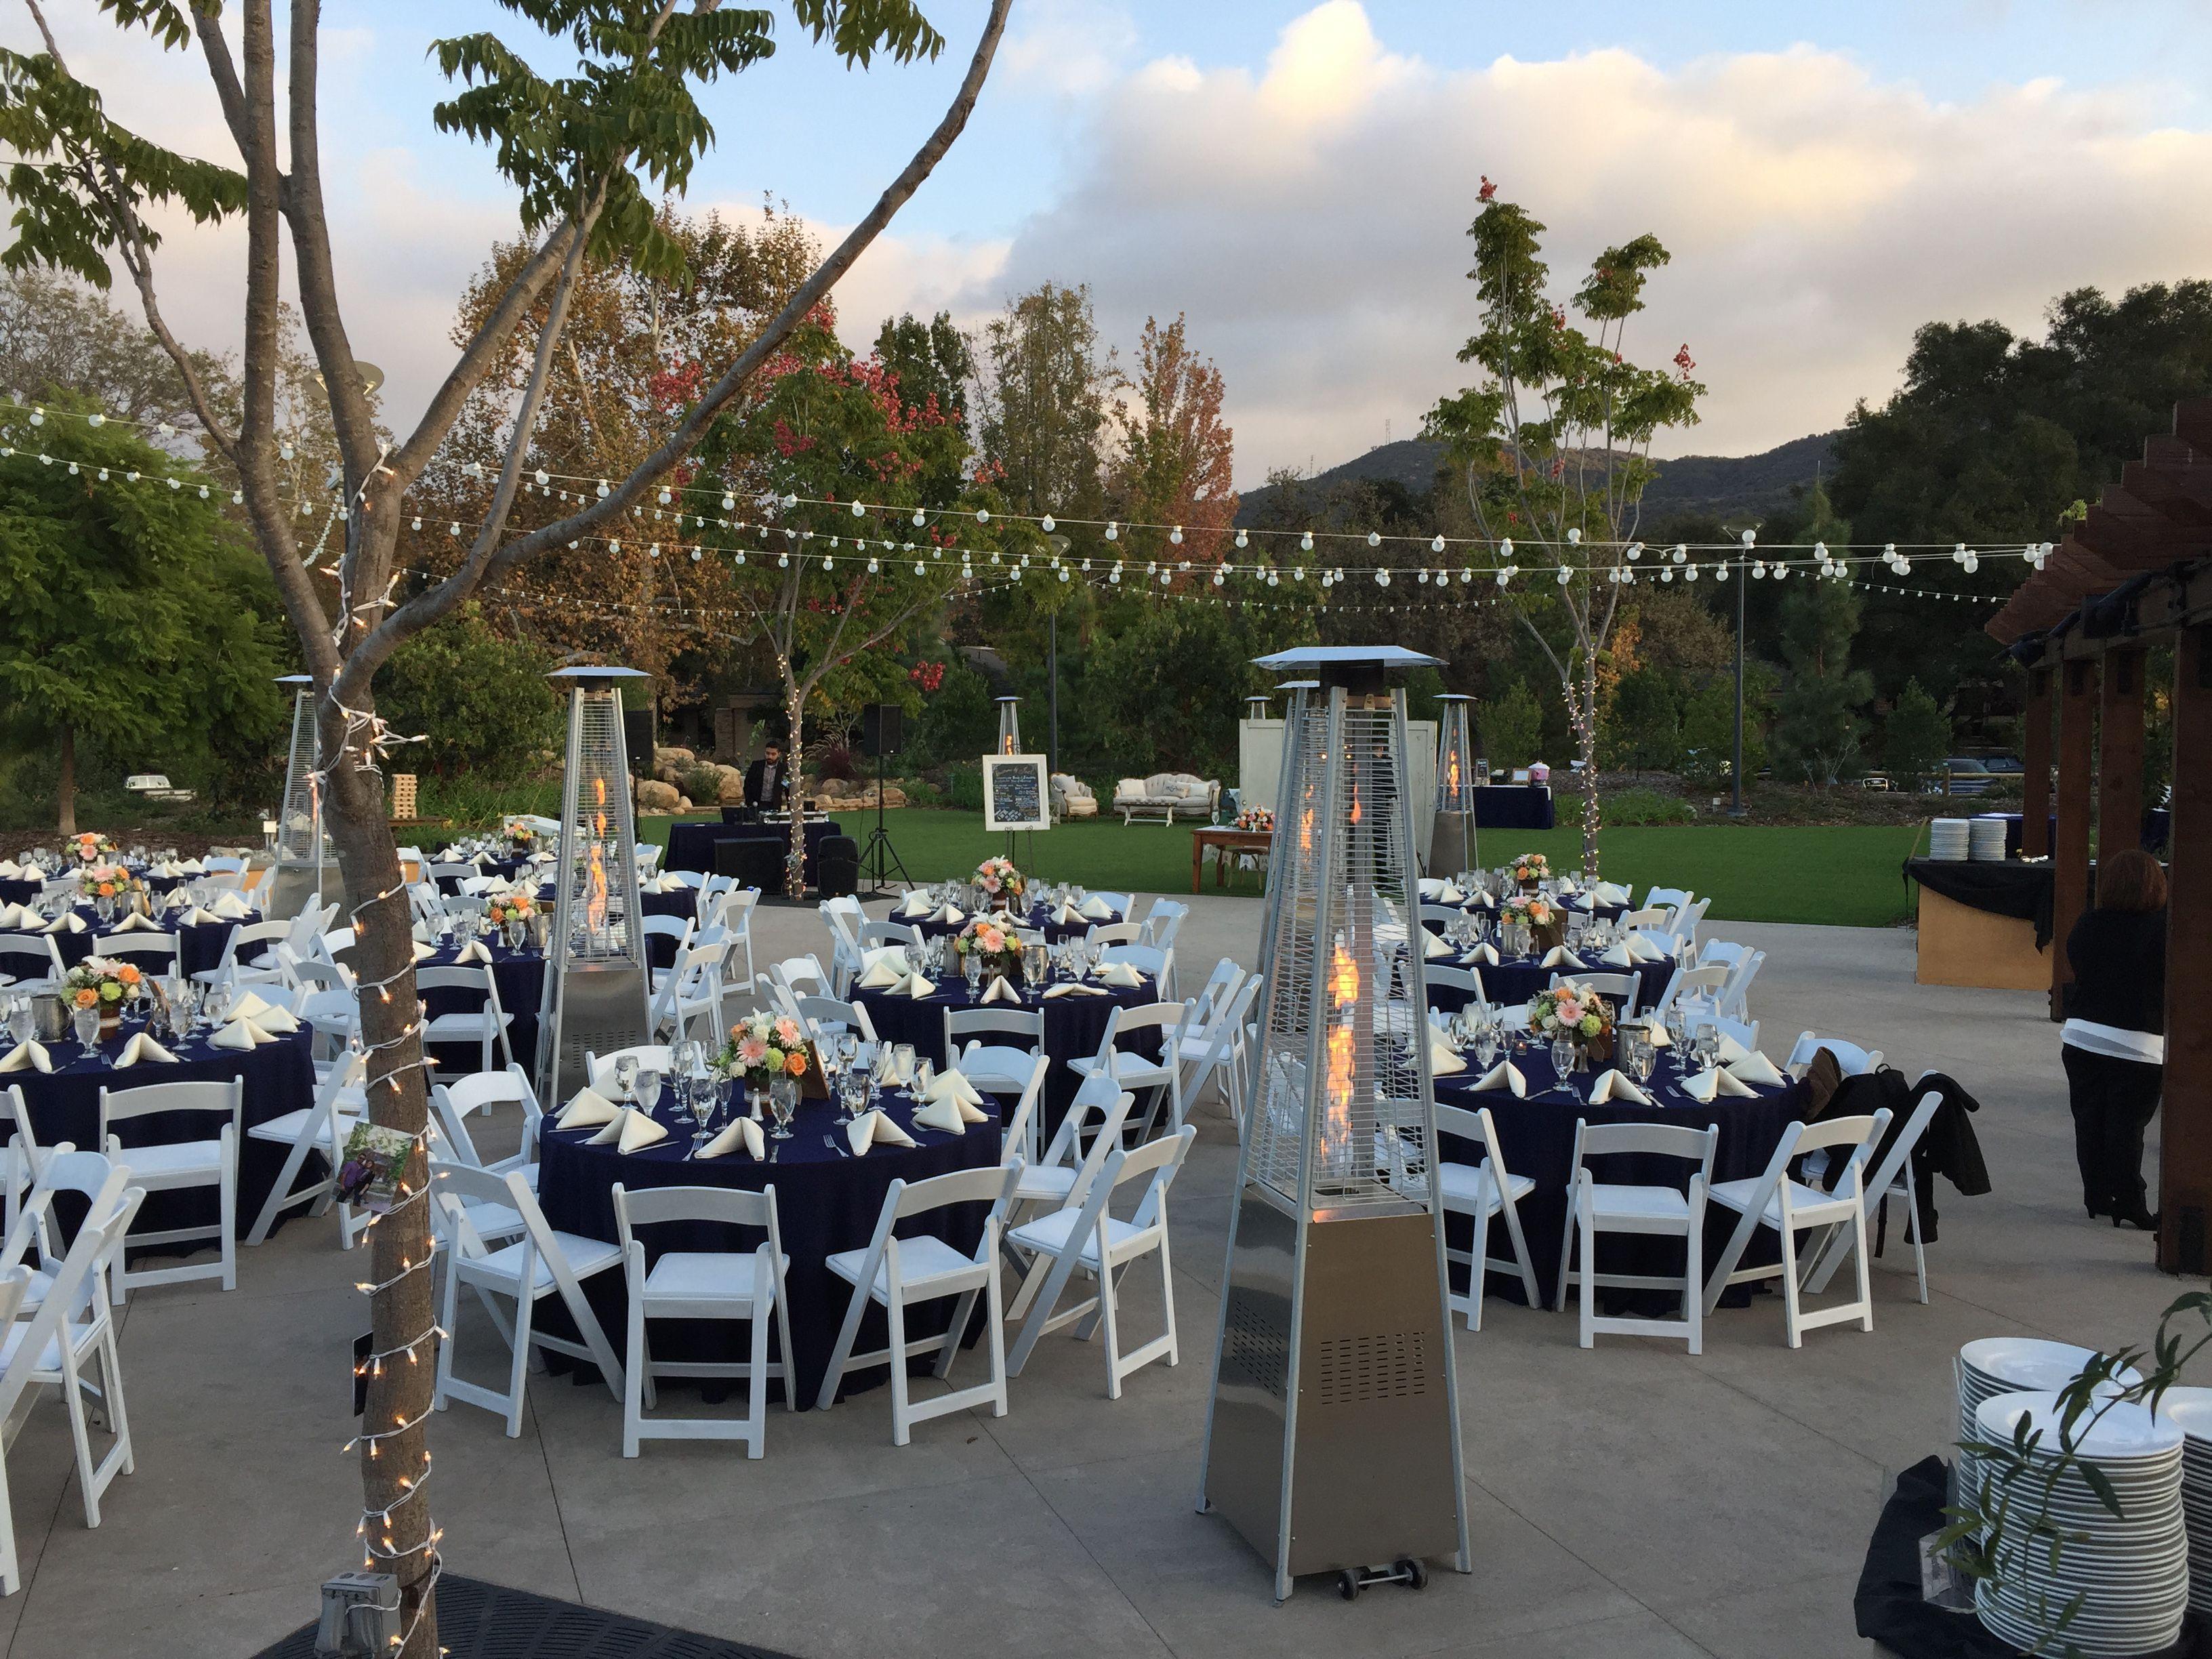 d3c0923a9d81474890679f3cd817ef1d - The Gardens At Los Robles Greens